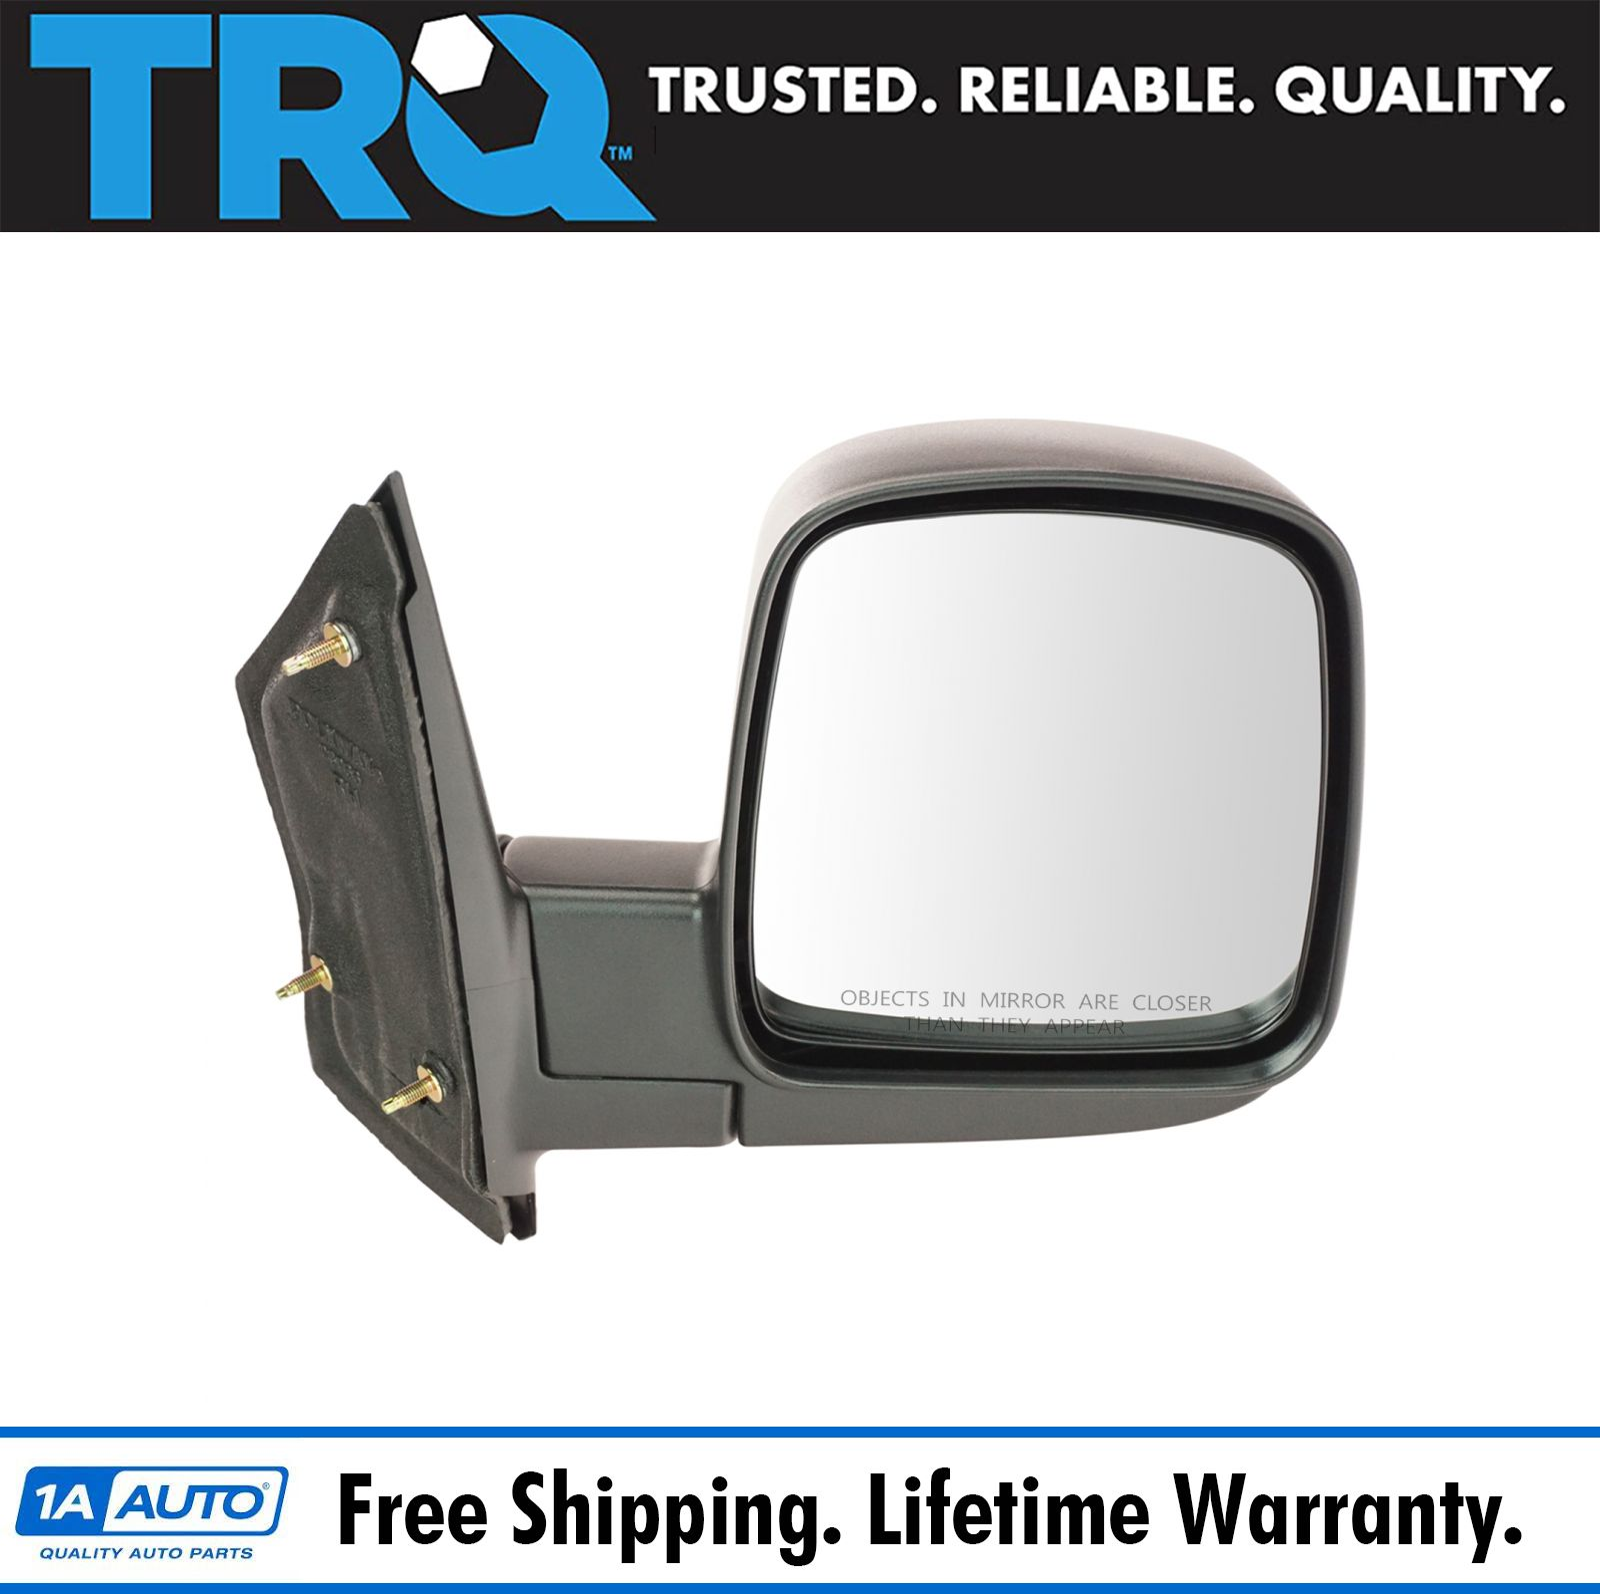 Folding Power Mirror RH Right Passenger Side Door for Chevy Cutlass Malibu Olds